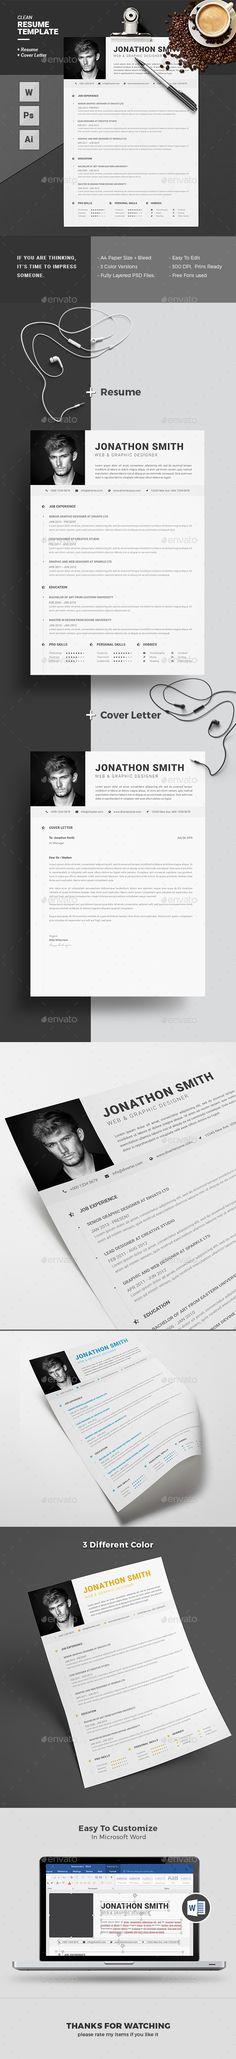 Resume Template PSD, Vector EPS, AI Illustrator, MS Word. Download here: https://graphicriver.net/item/resume/17370569?ref=ksioks